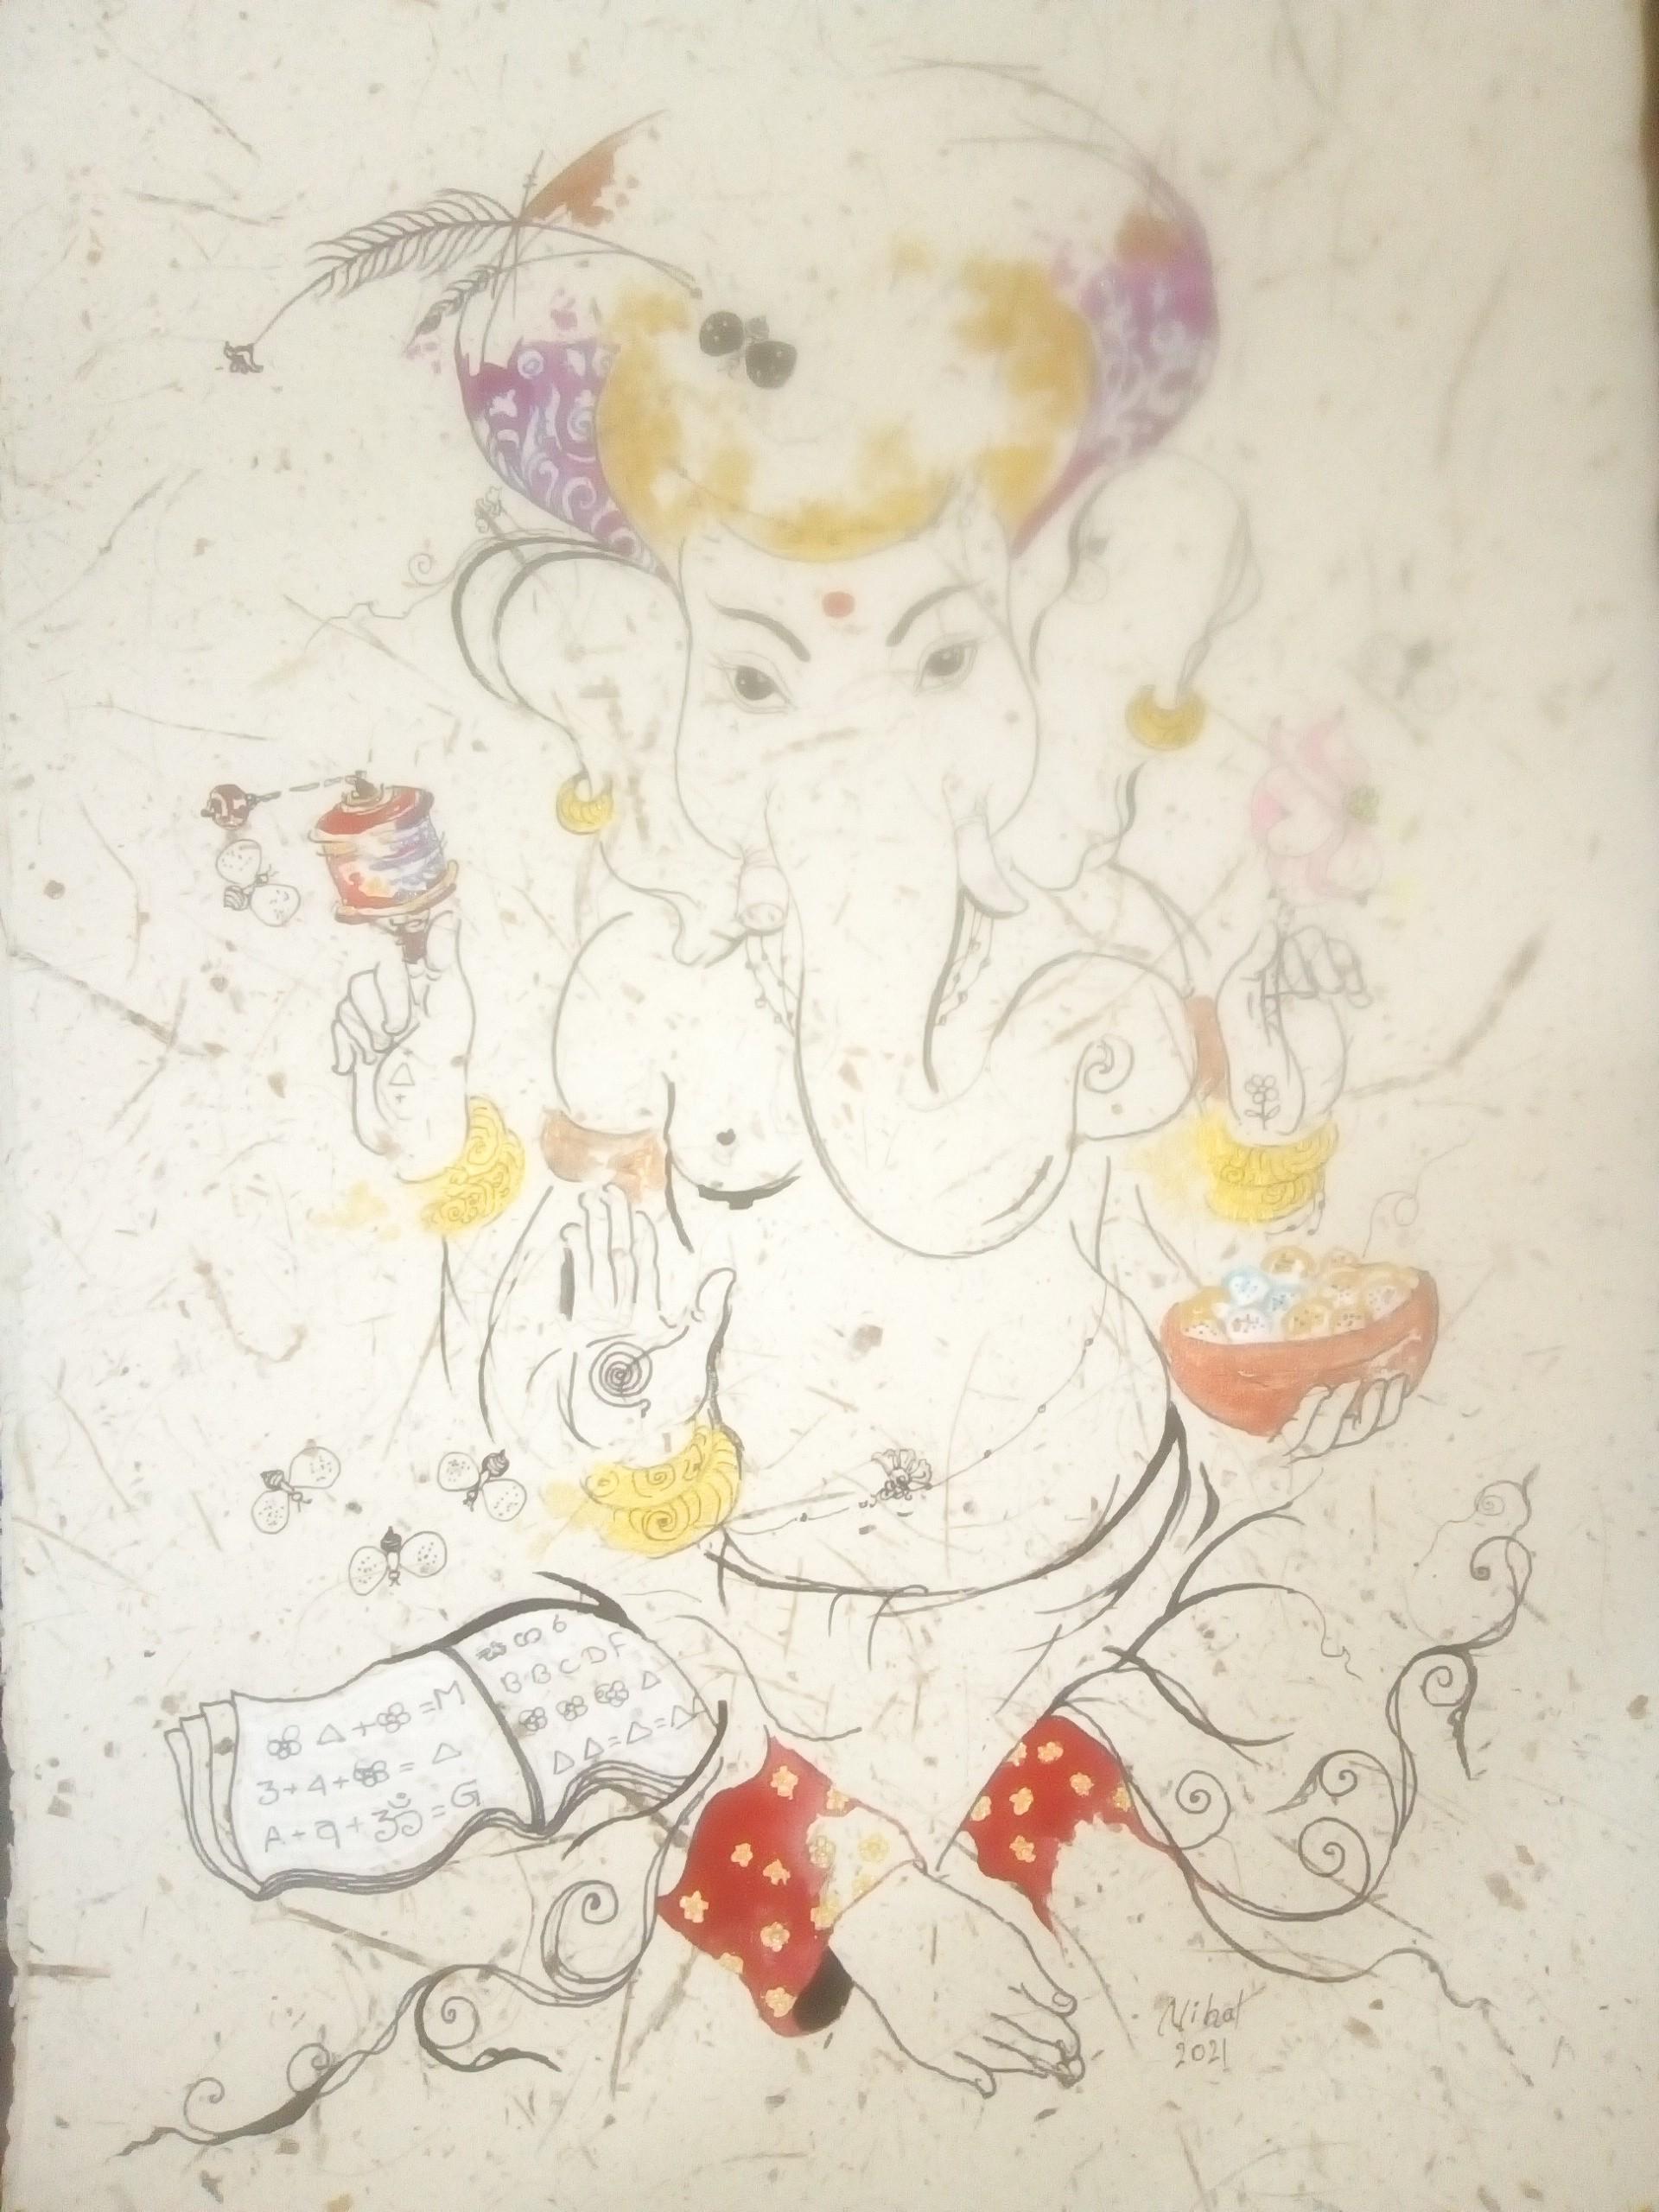 Lord ganesha by Nihal Senarathna